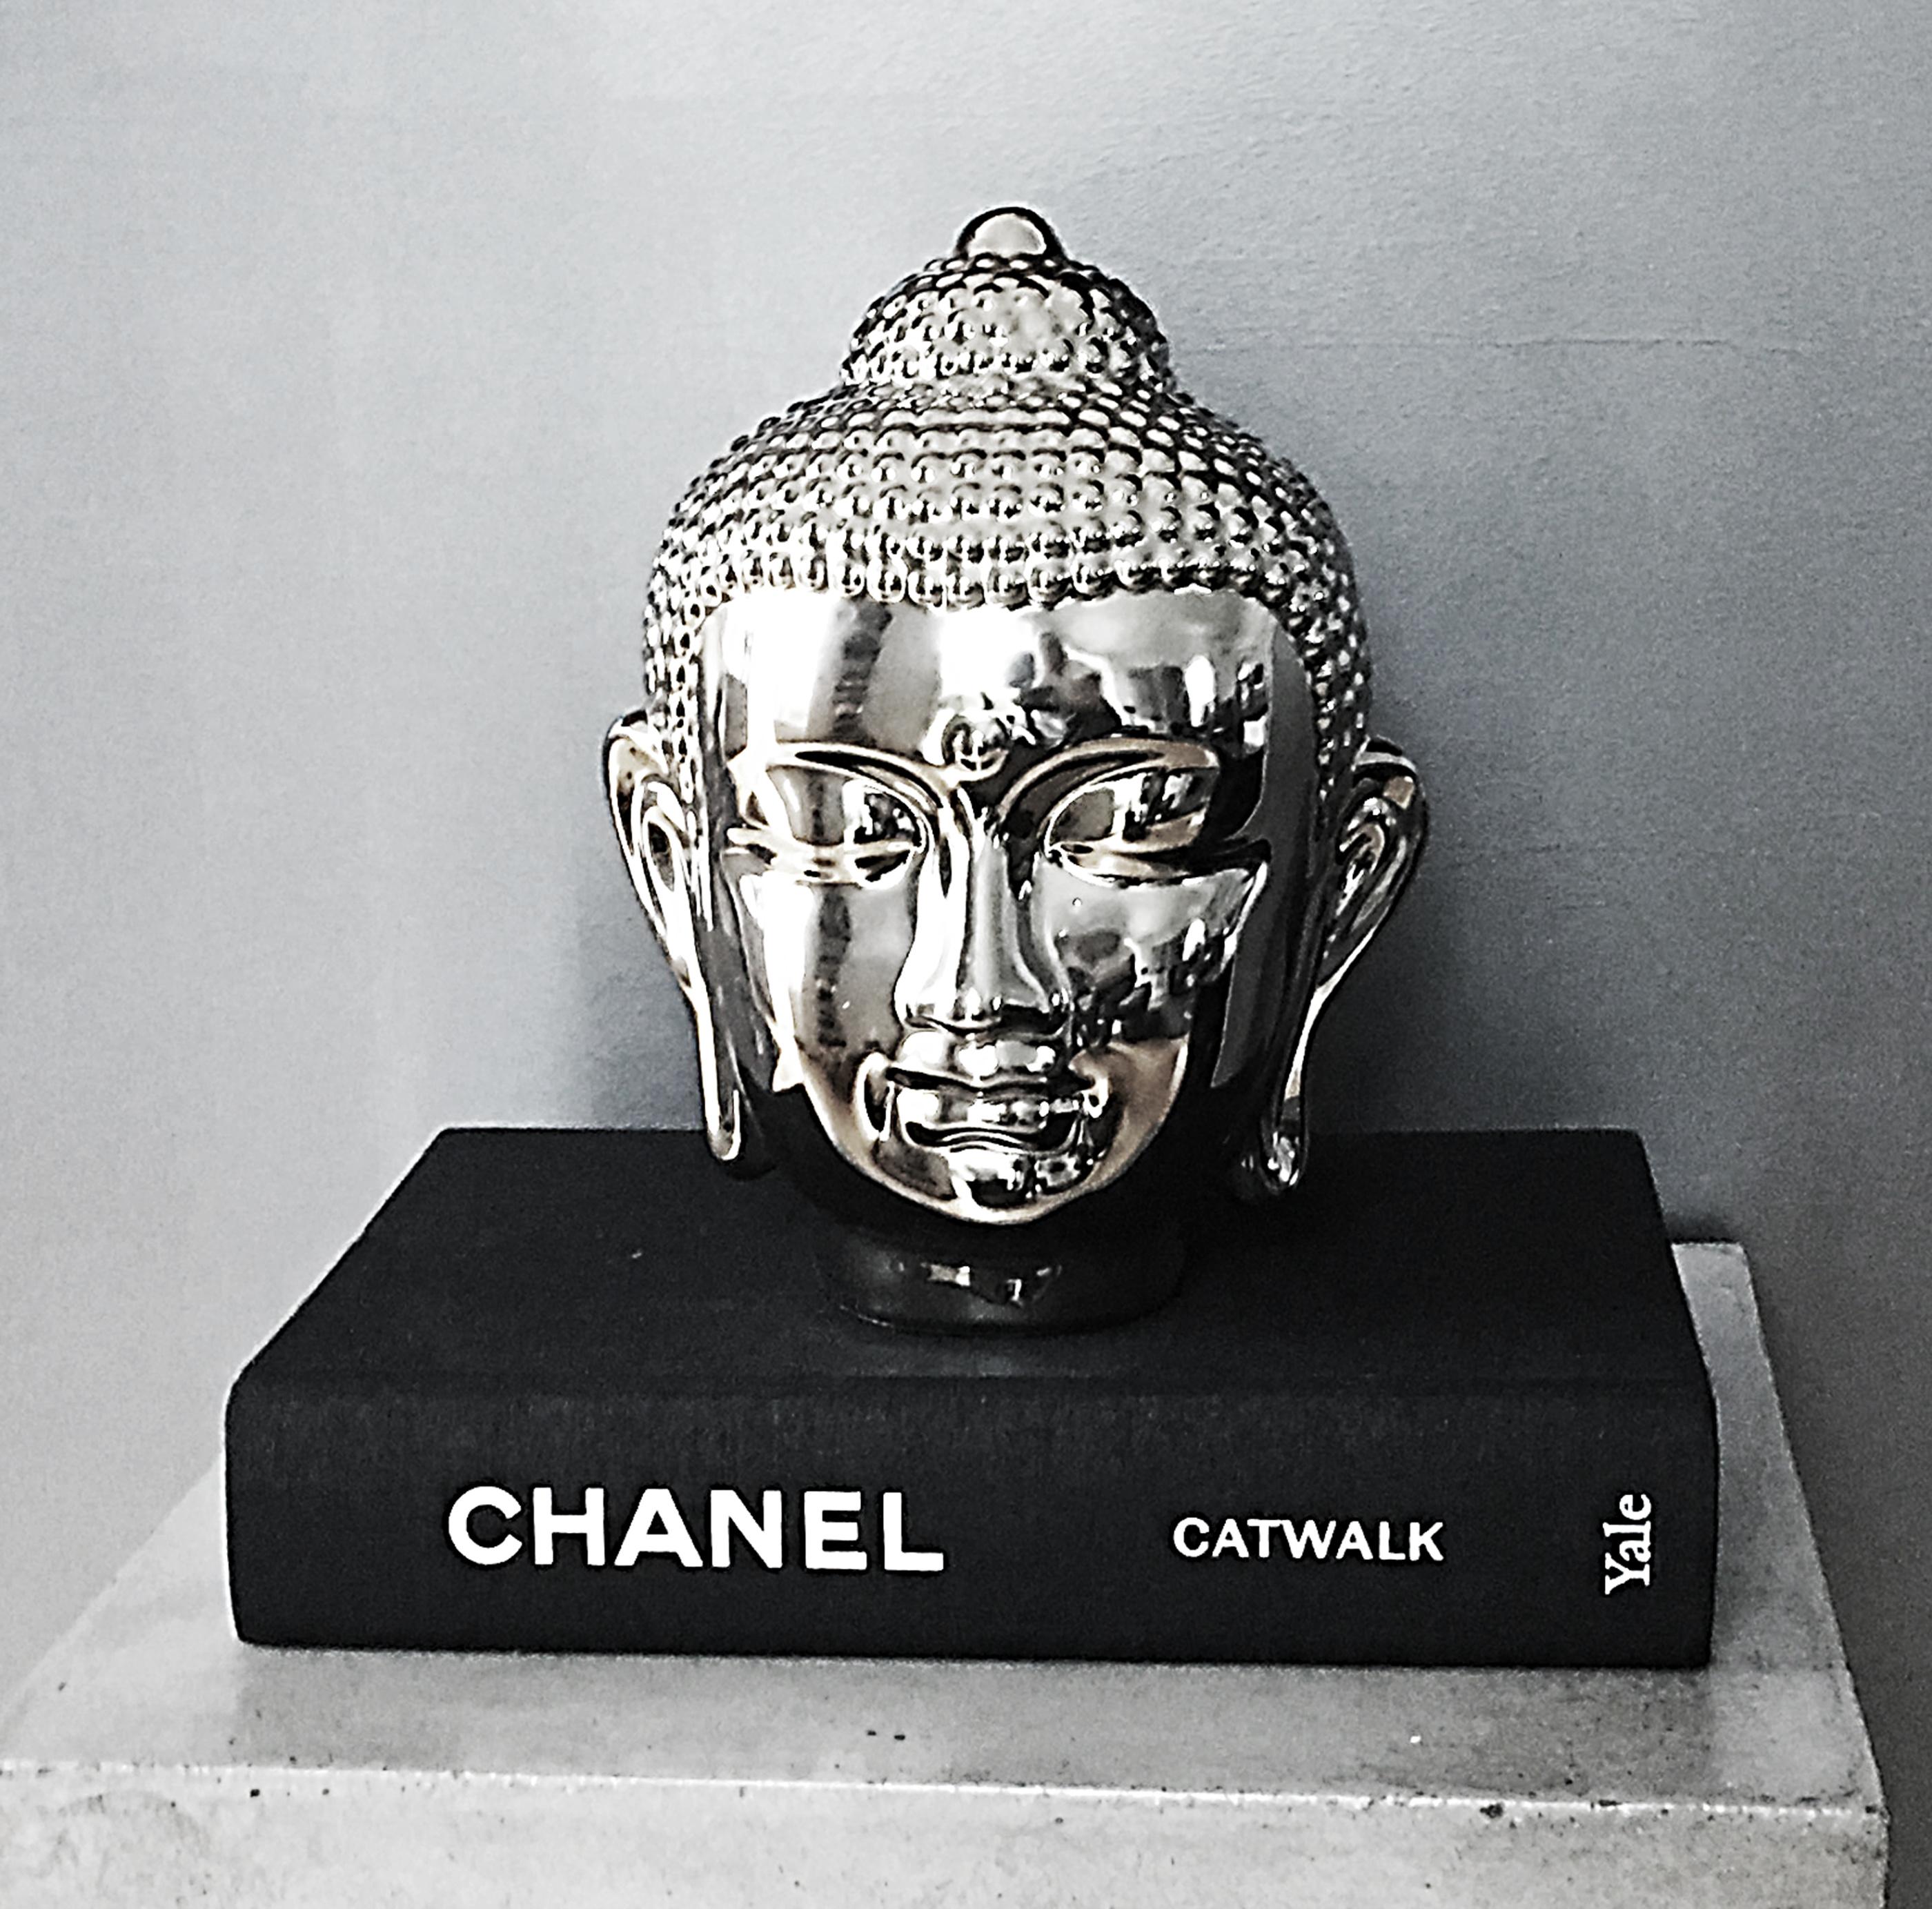 image by me buddha